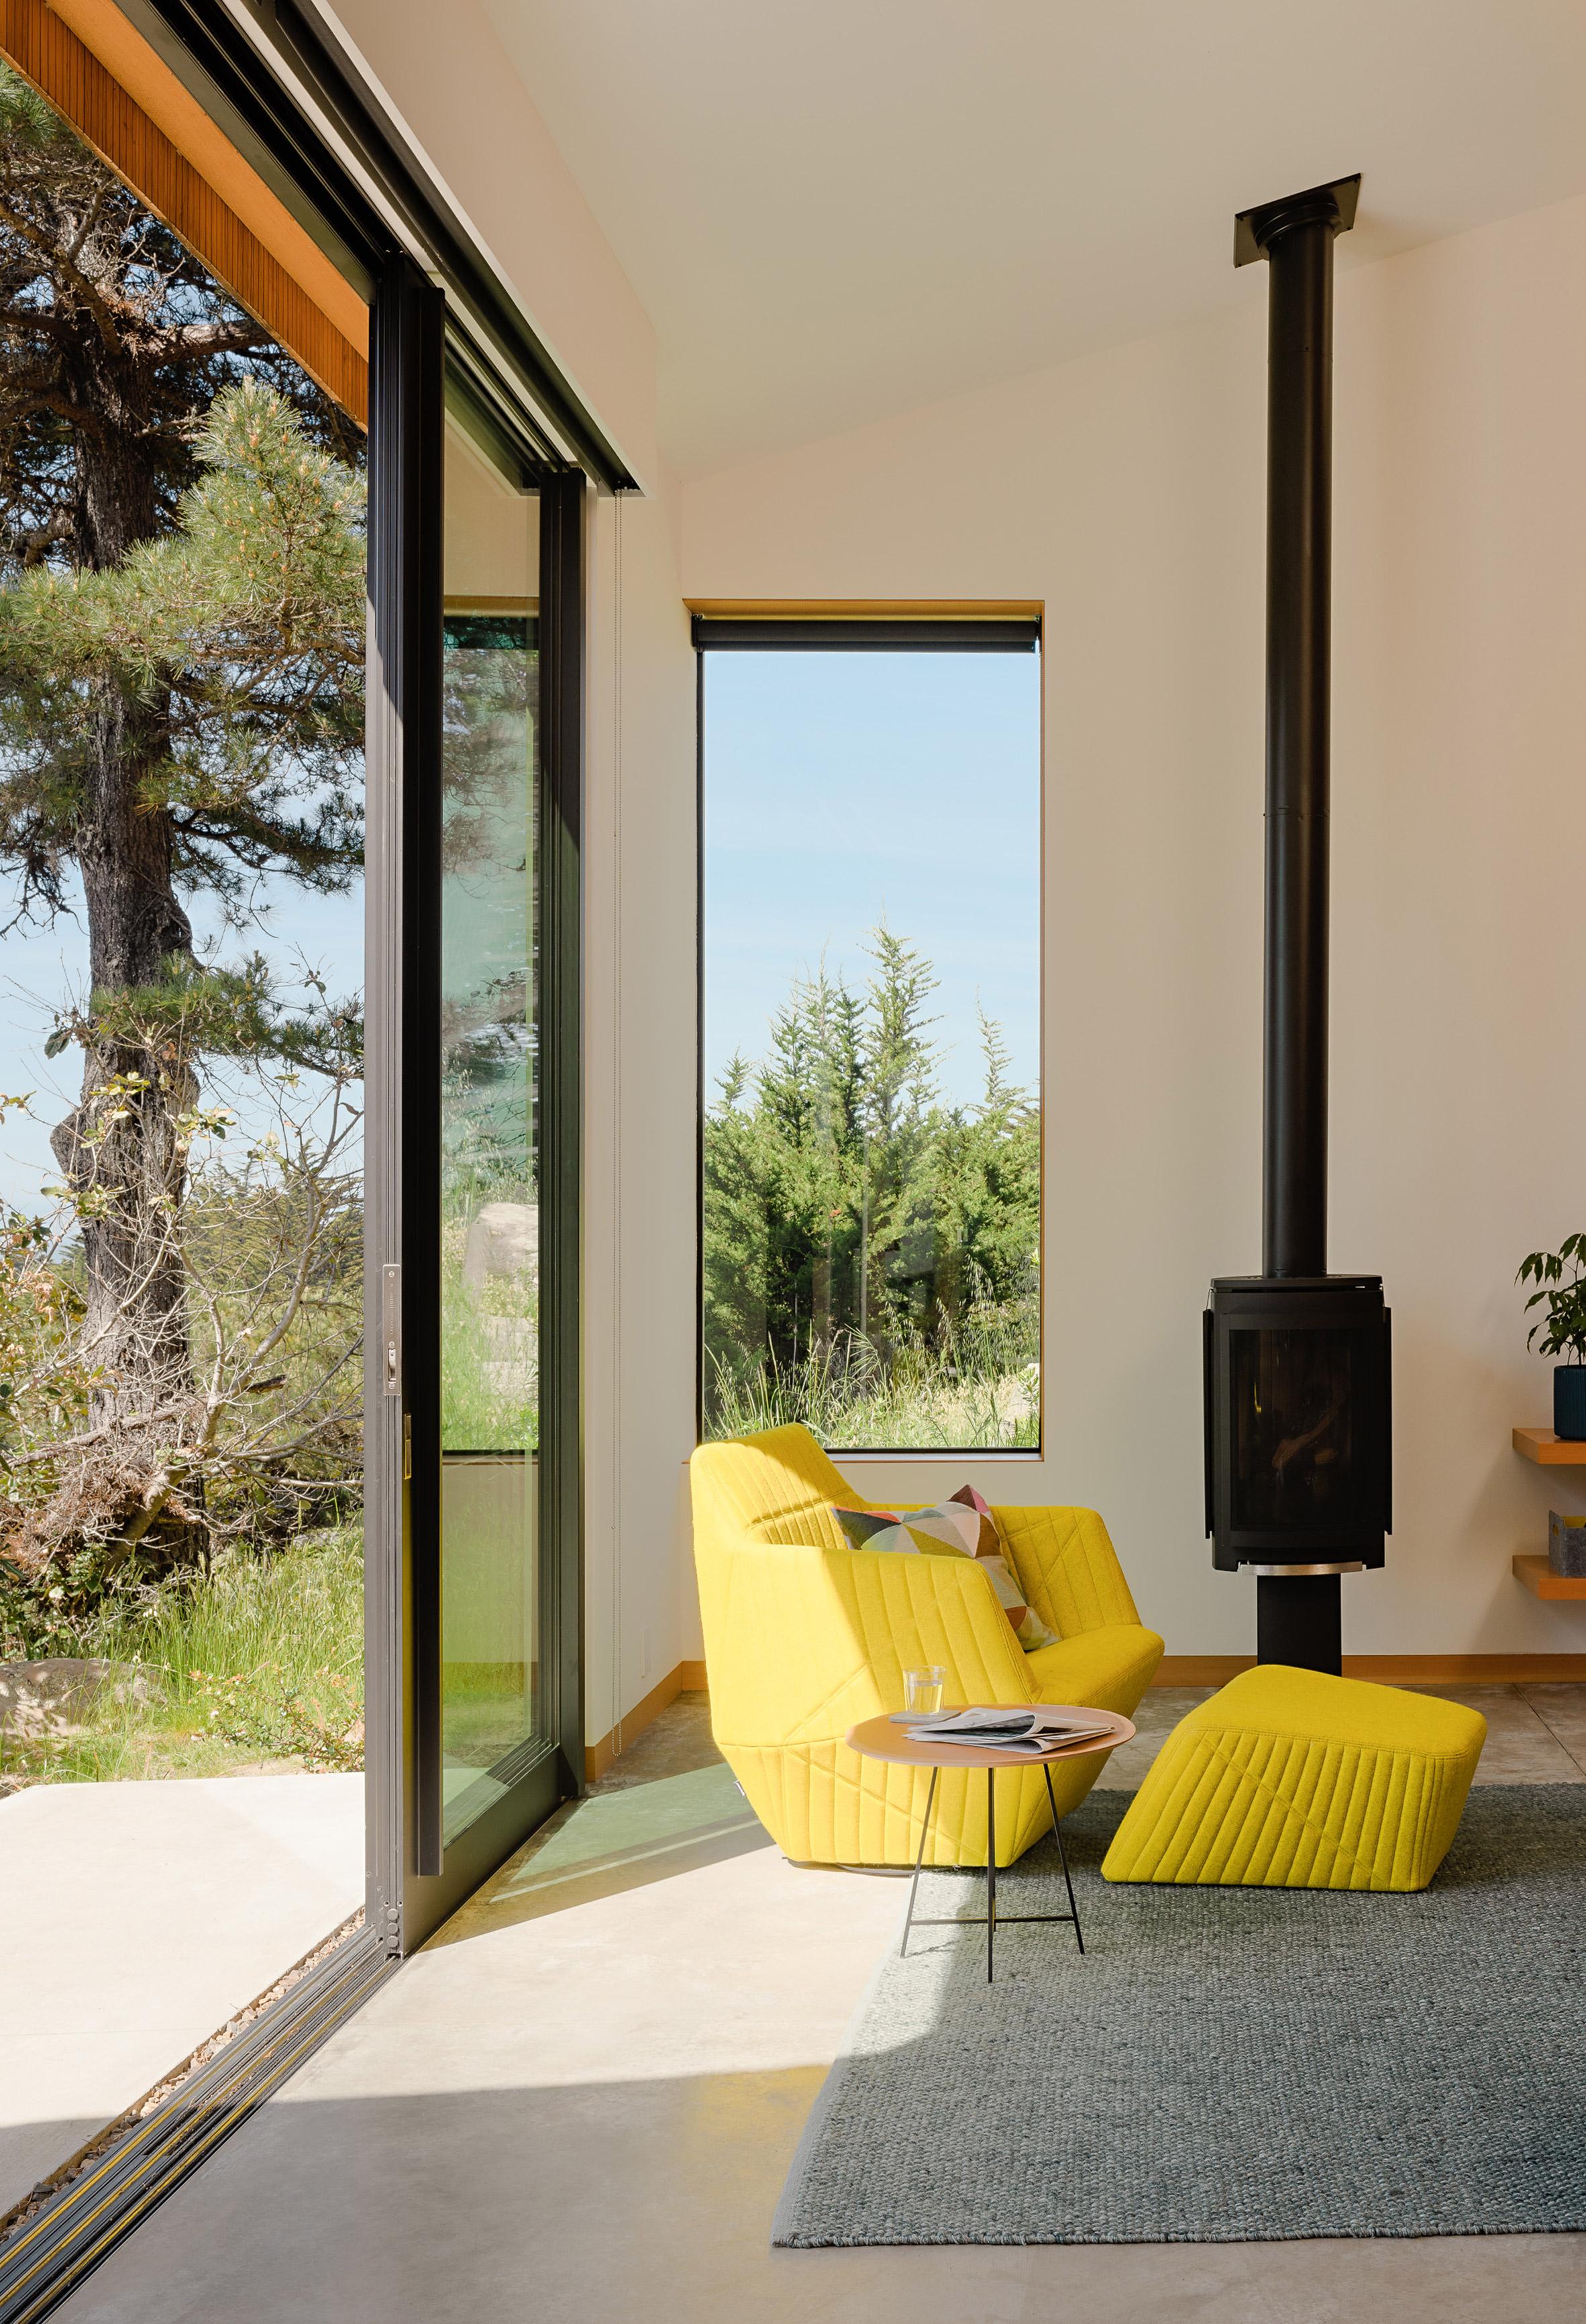 nhà bên biển coastal-retreat-malcolm-davis-architecture-sea-ranch-sonoma-county-califorinia-relaxing-space-elledecoration vn 6